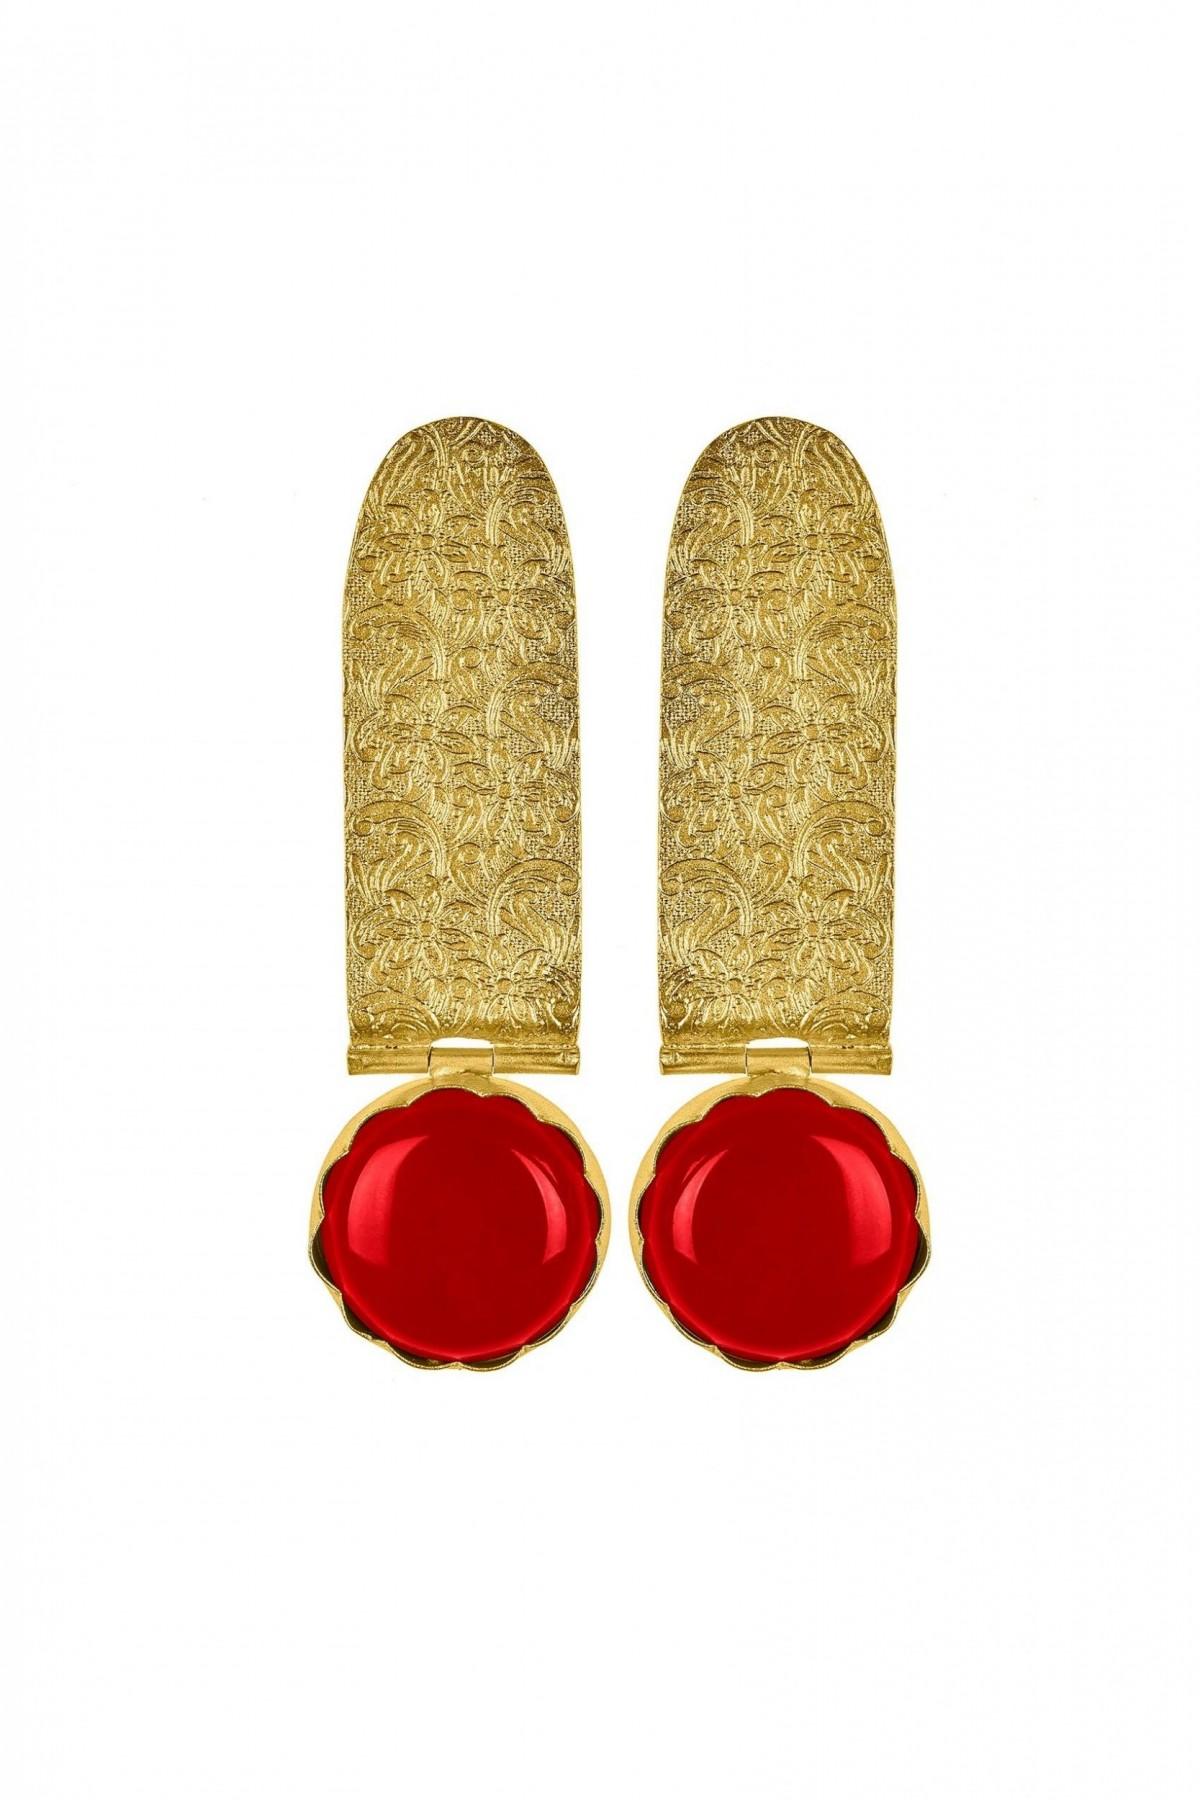 Vogue Earrings